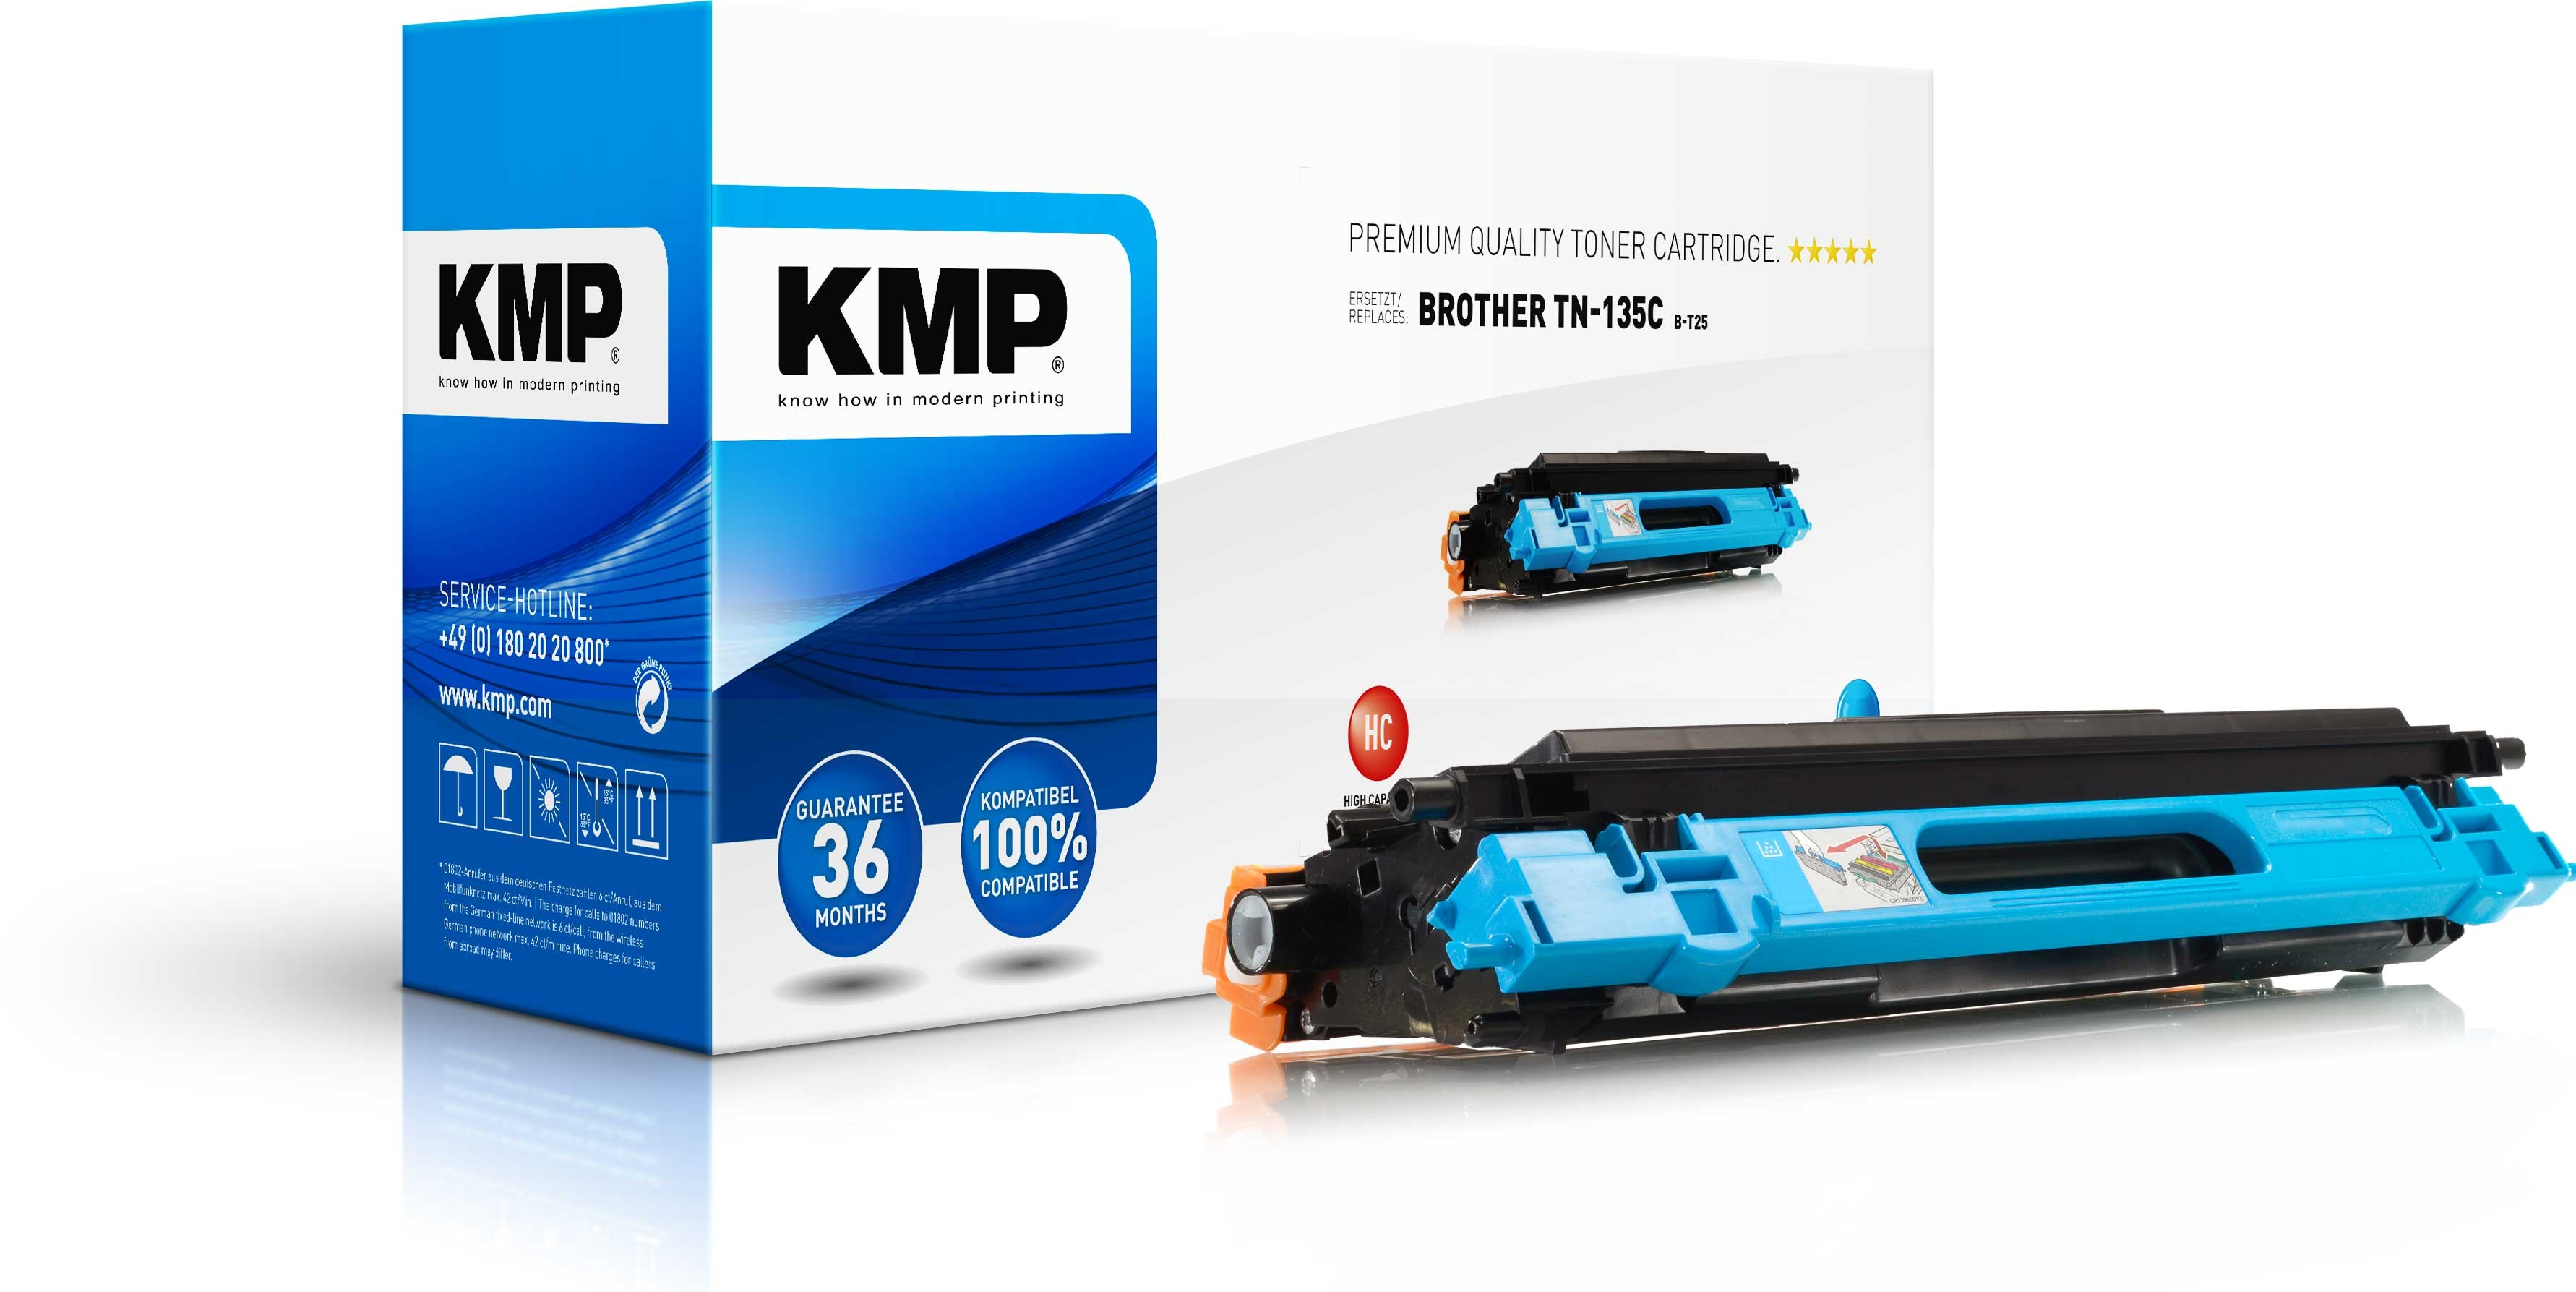 Vorschau: KMP Toner B-T25 für Brother TN-135C HL-4040 4050 4070 ... cyan